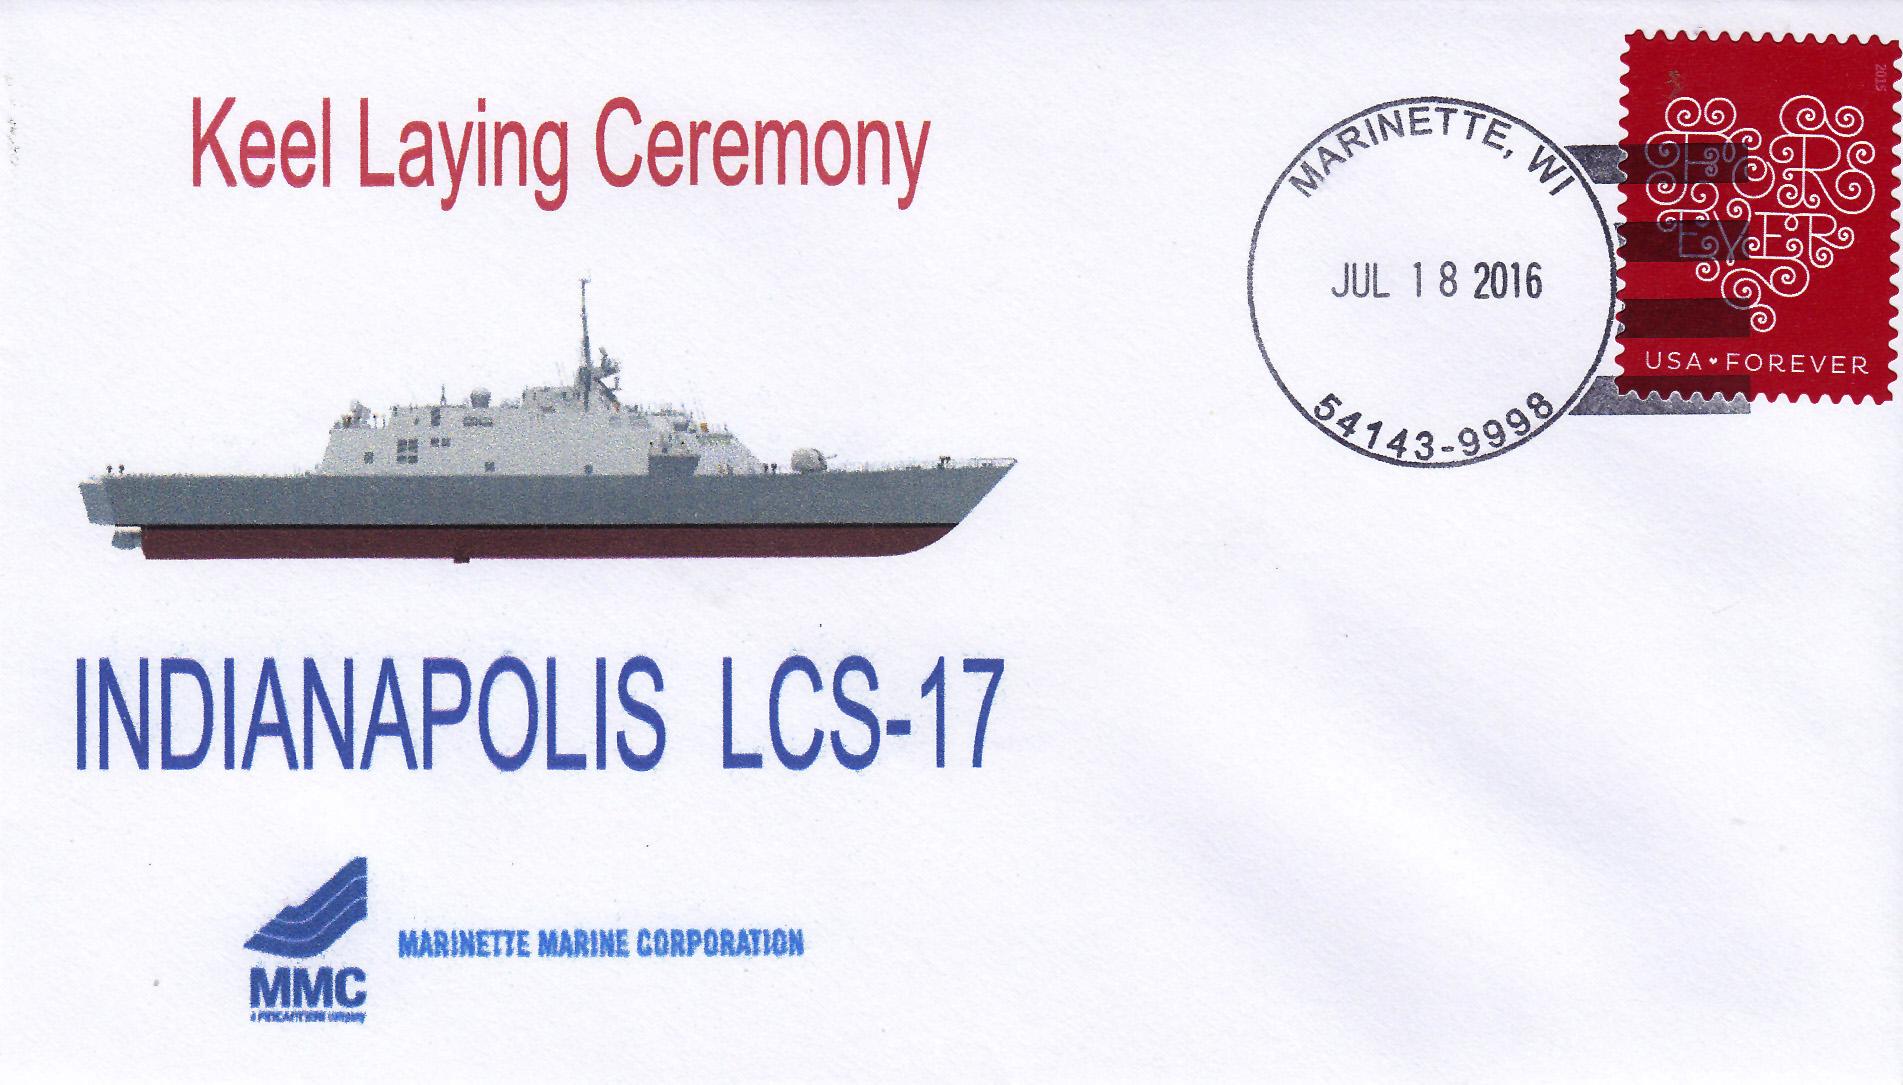 Beleg USS INDIANAPOLIS LCS-17 Keel Laying